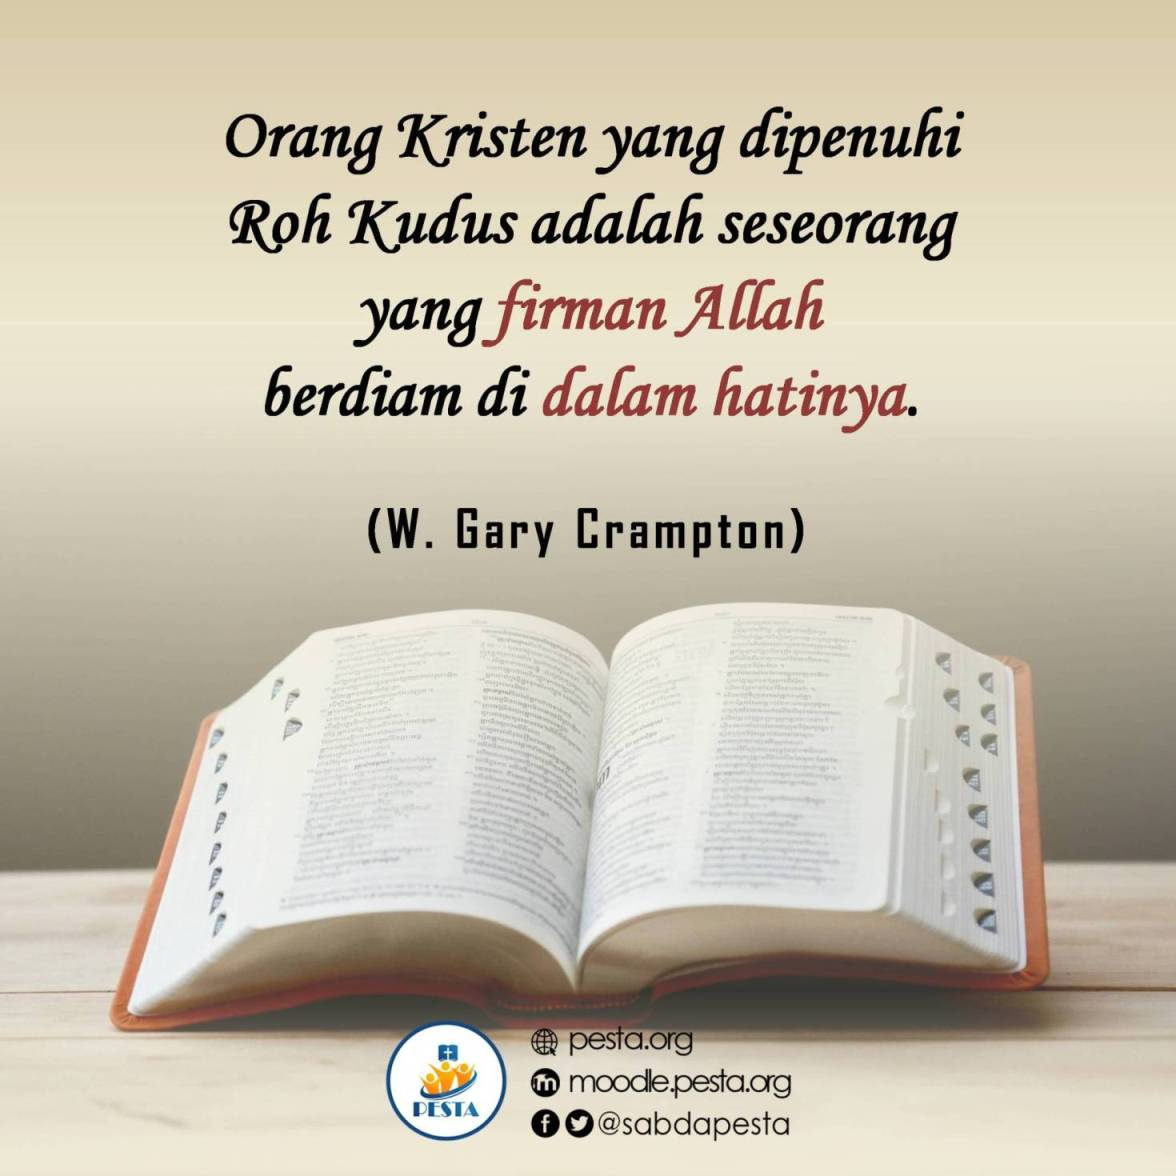 W. Gary Crampton